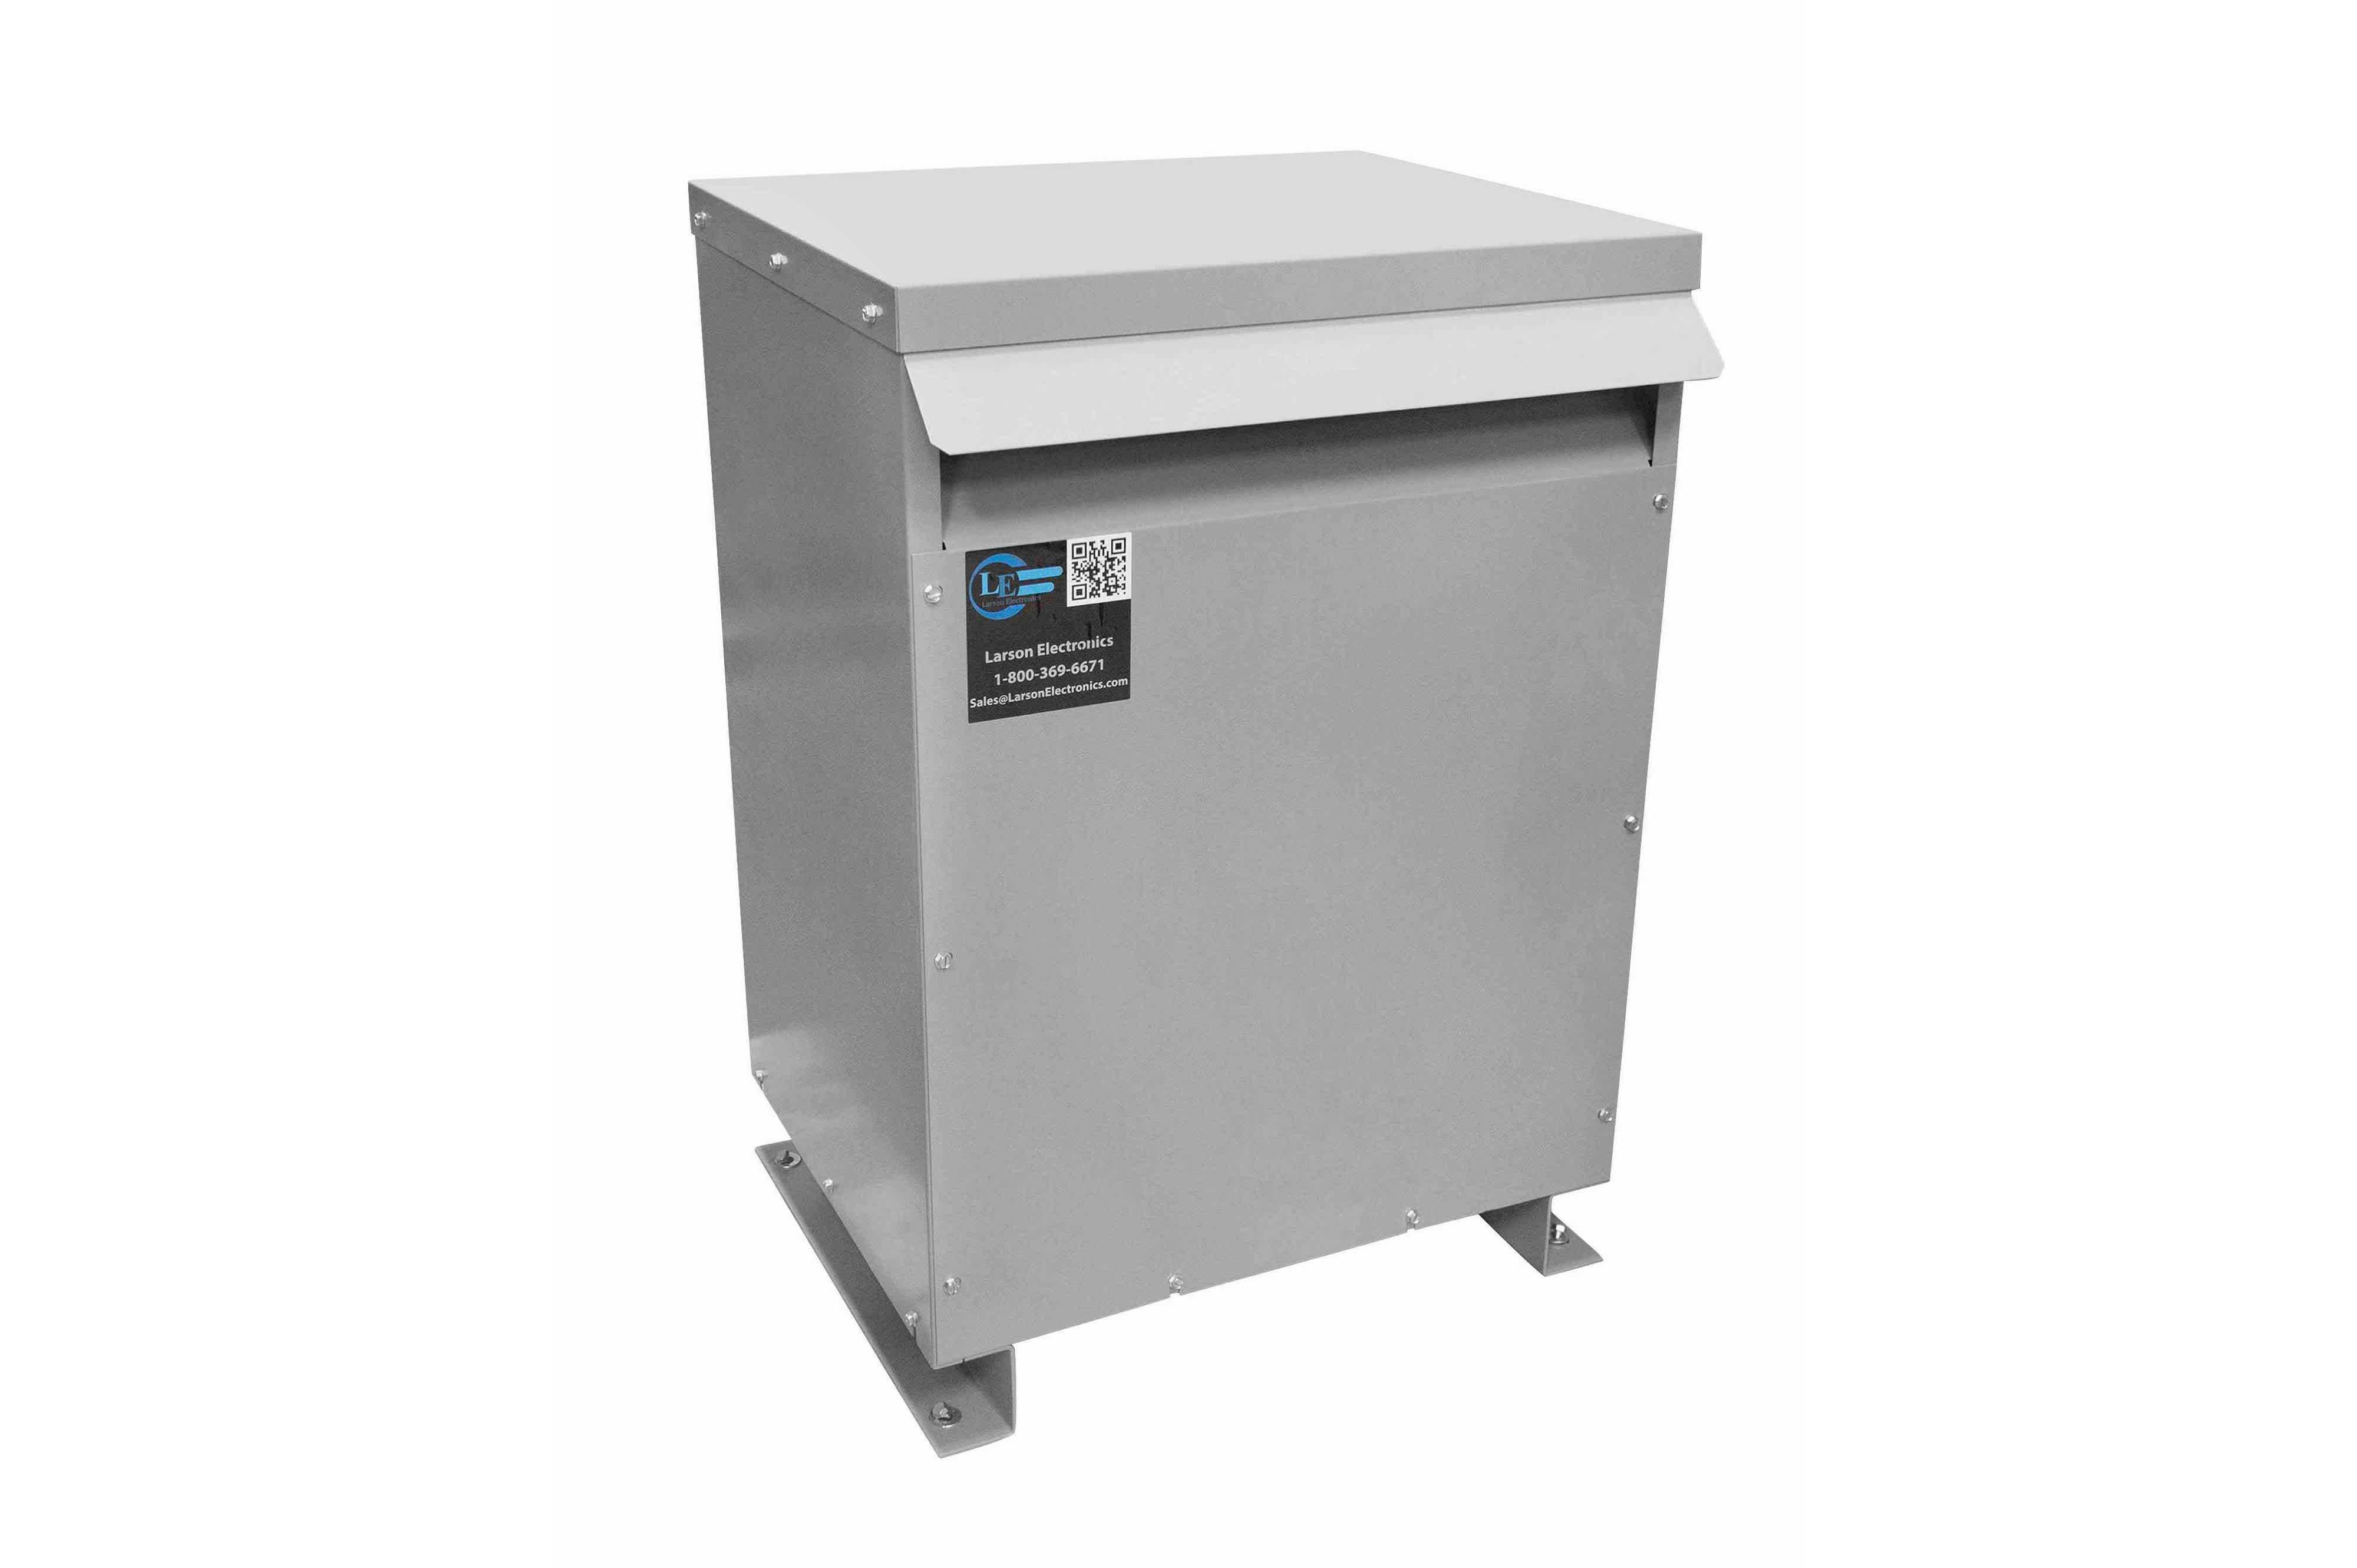 65 kVA 3PH Isolation Transformer, 380V Wye Primary, 600Y/347 Wye-N Secondary, N3R, Ventilated, 60 Hz